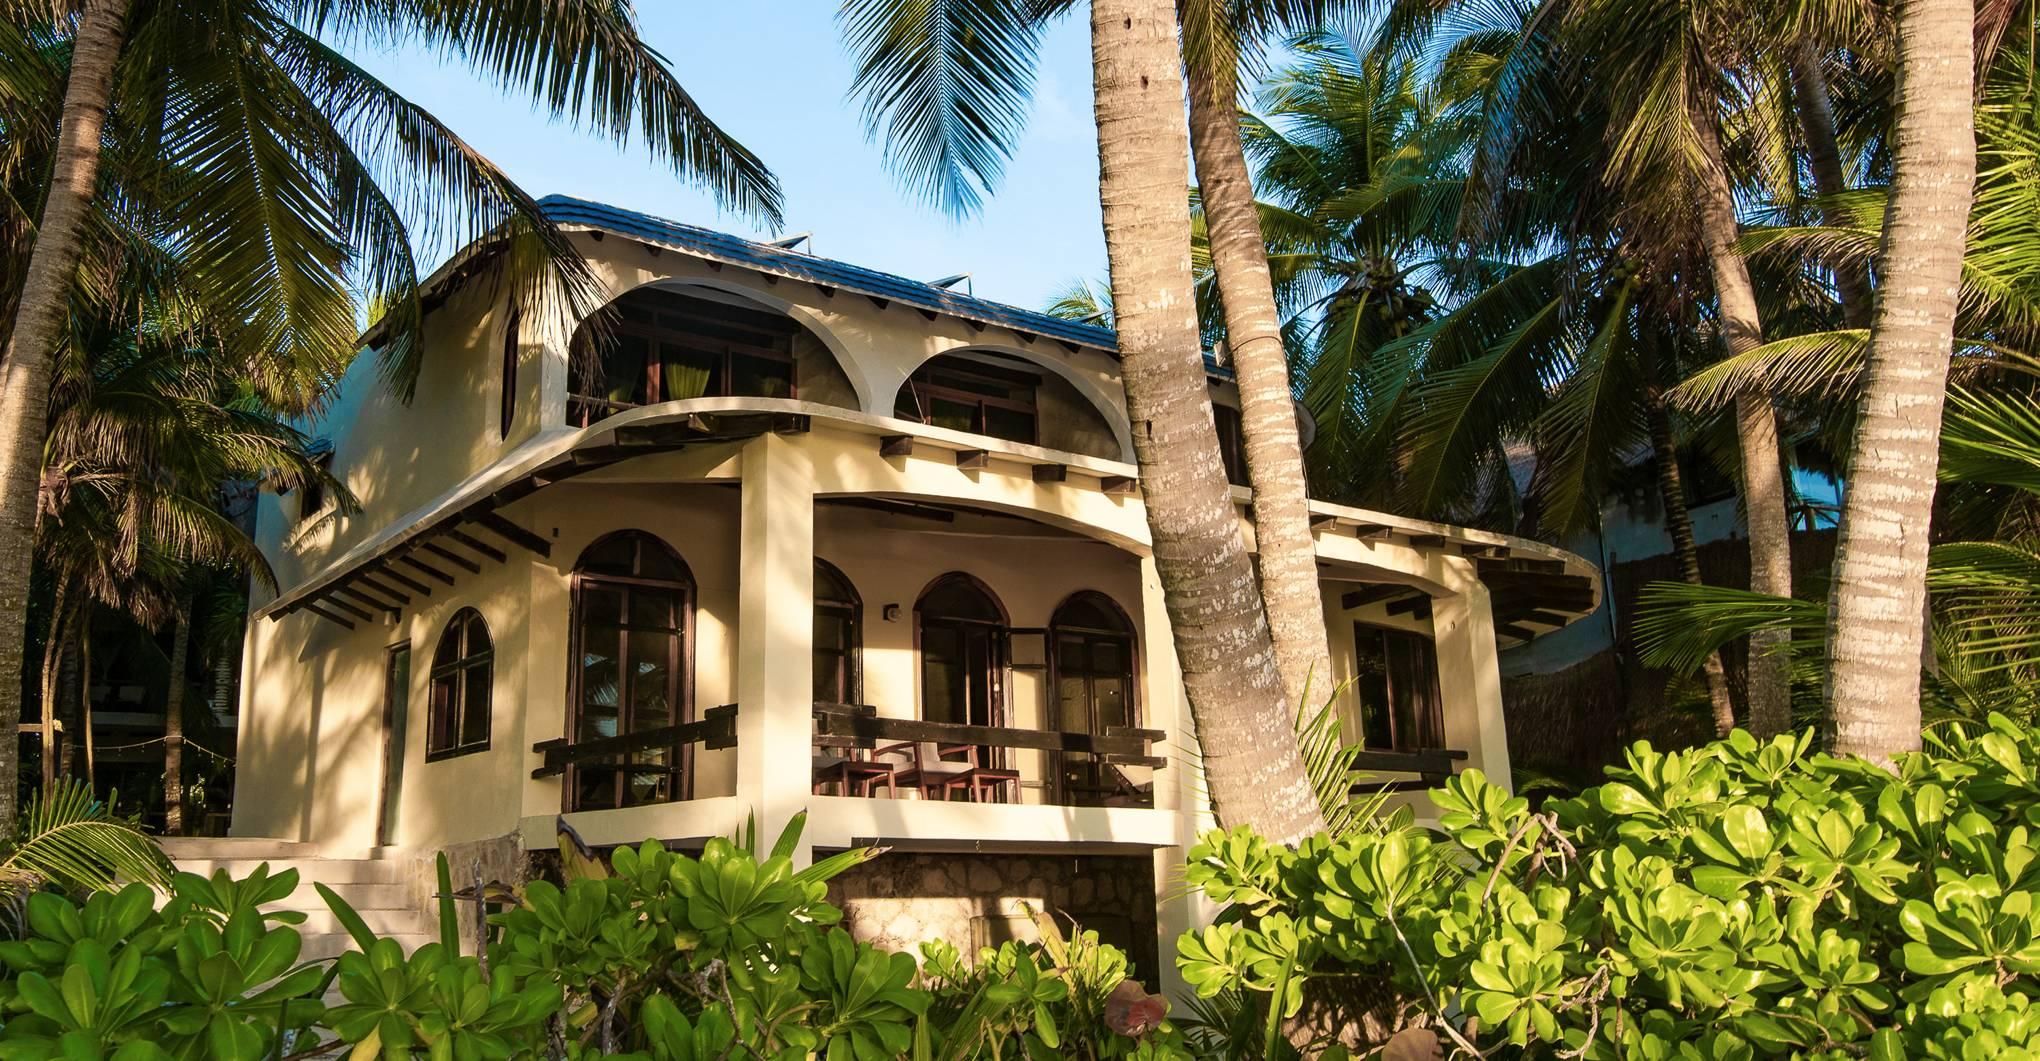 Casa de Las Olas, Tulum, Mexico hotel review